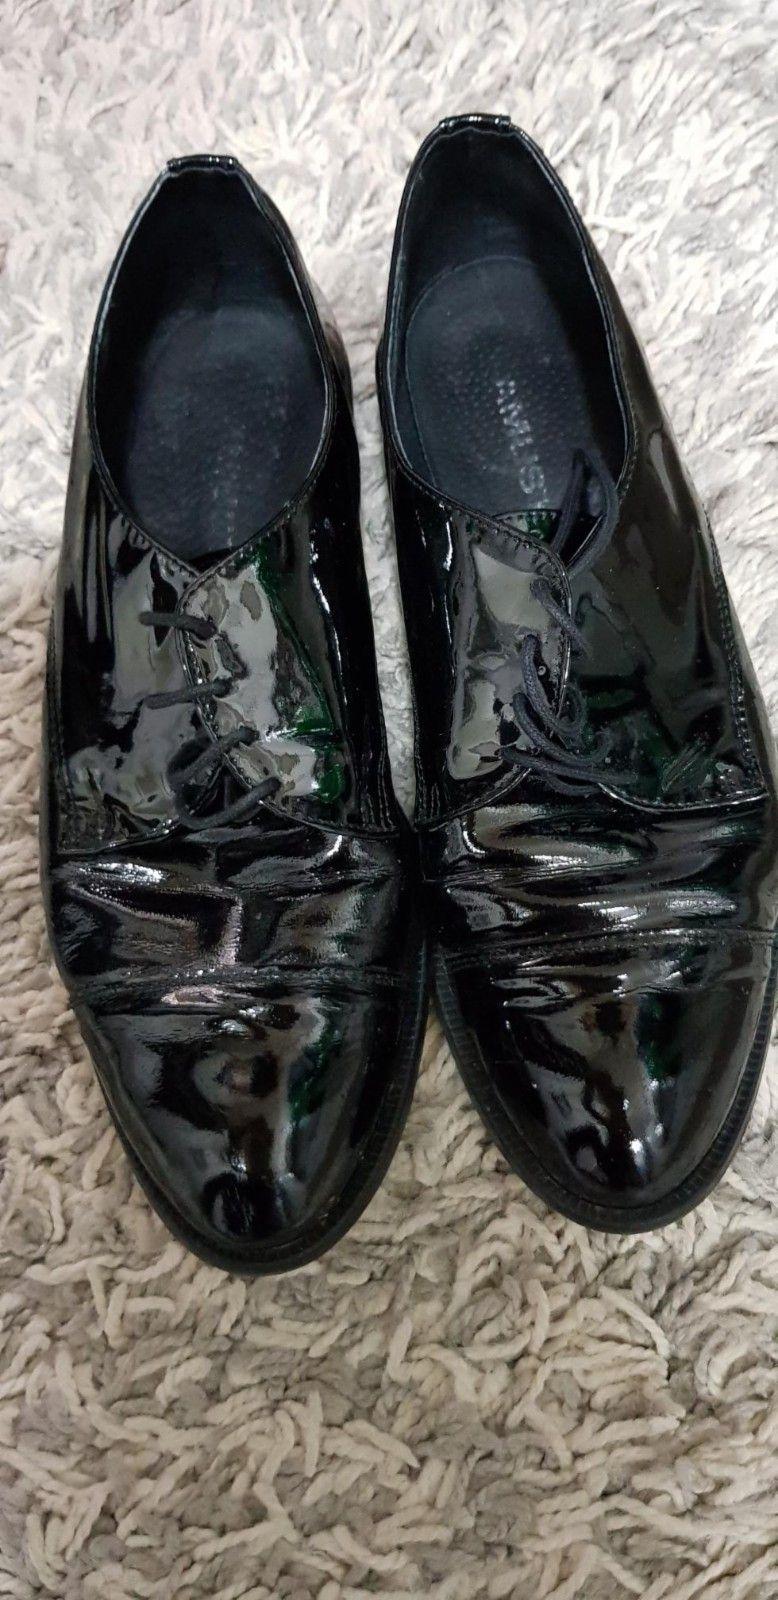 d80177b35bd Dame Sort Flate sko, Laced str.39 - Sorte Chrissy Sko fra Amust ...